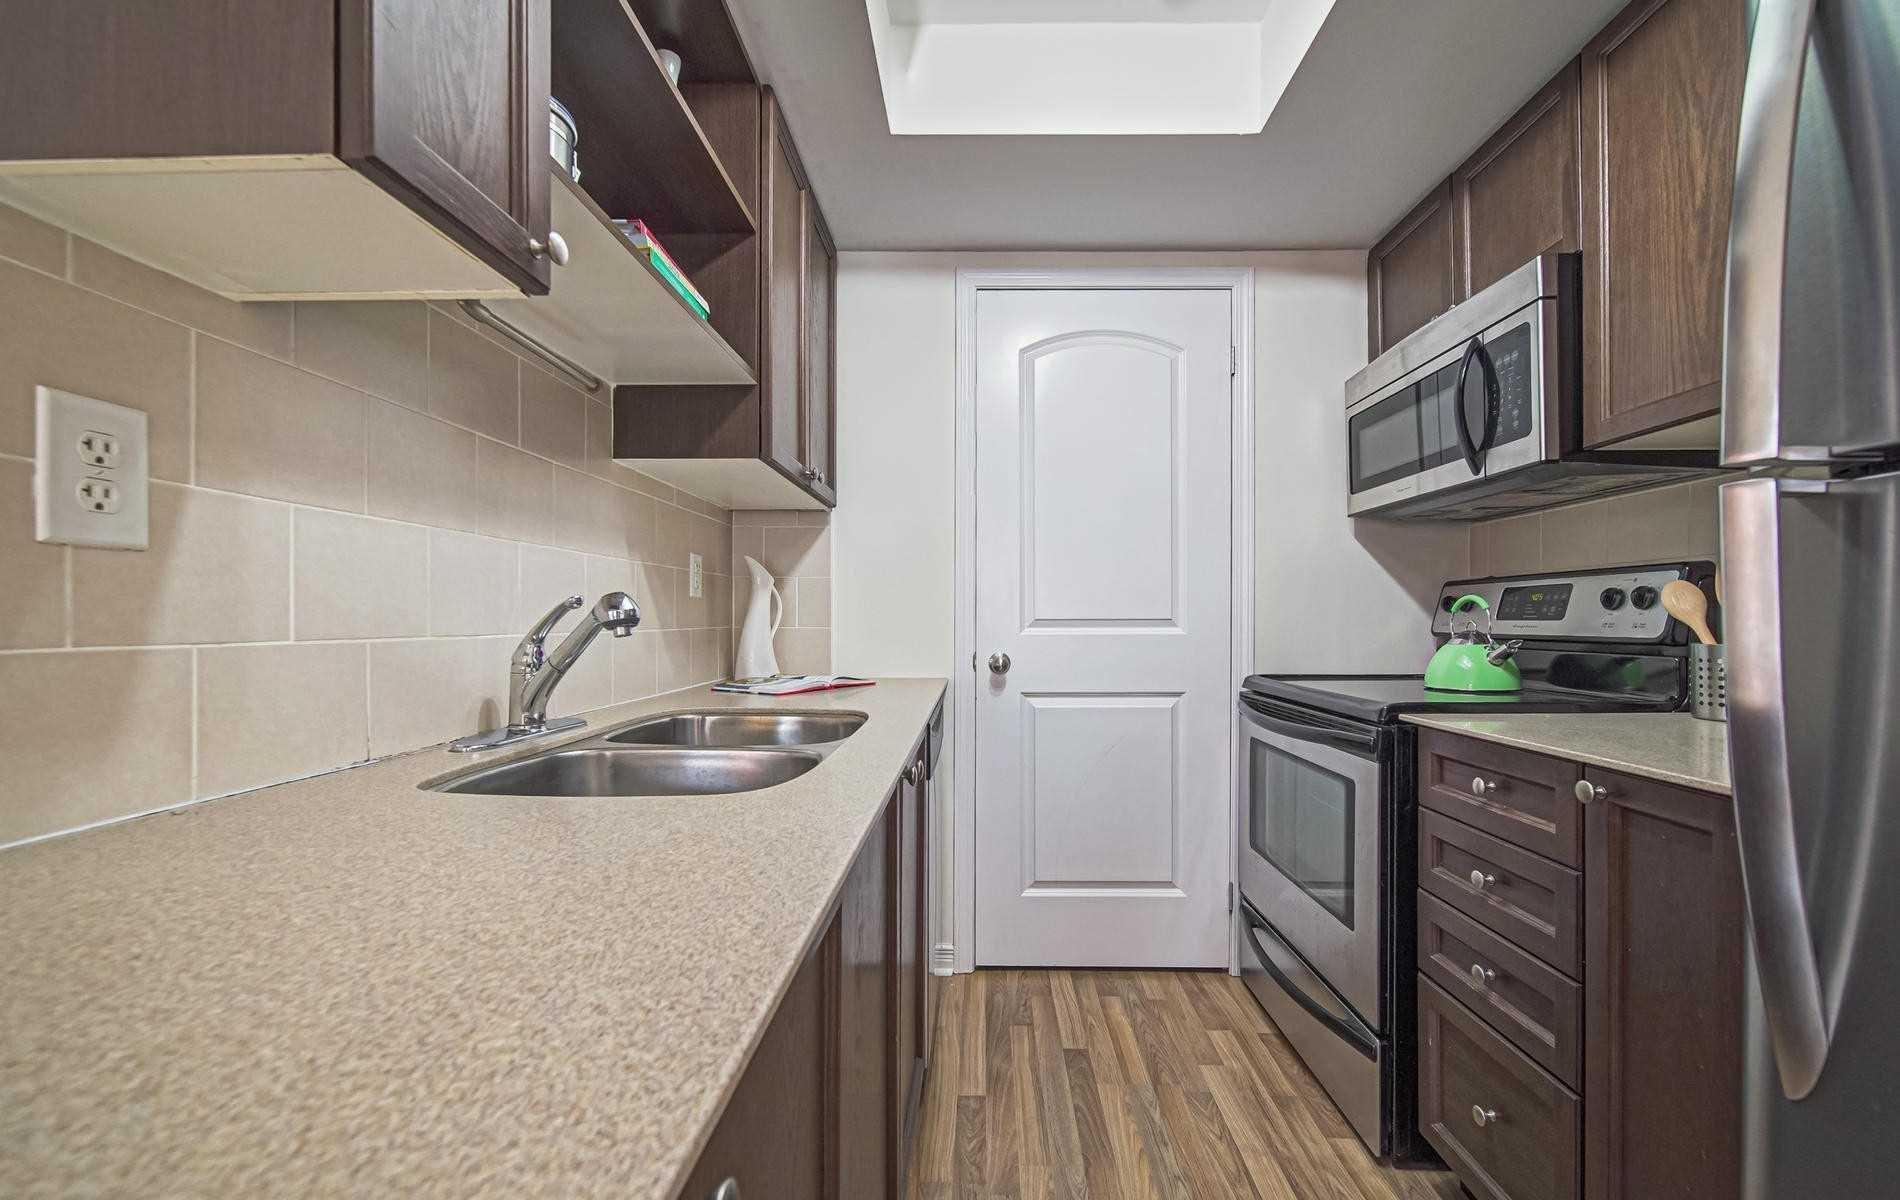 Photo 7: Photos: 3 78 Munro Street in Toronto: South Riverdale Condo for sale (Toronto E01)  : MLS®# E4615987